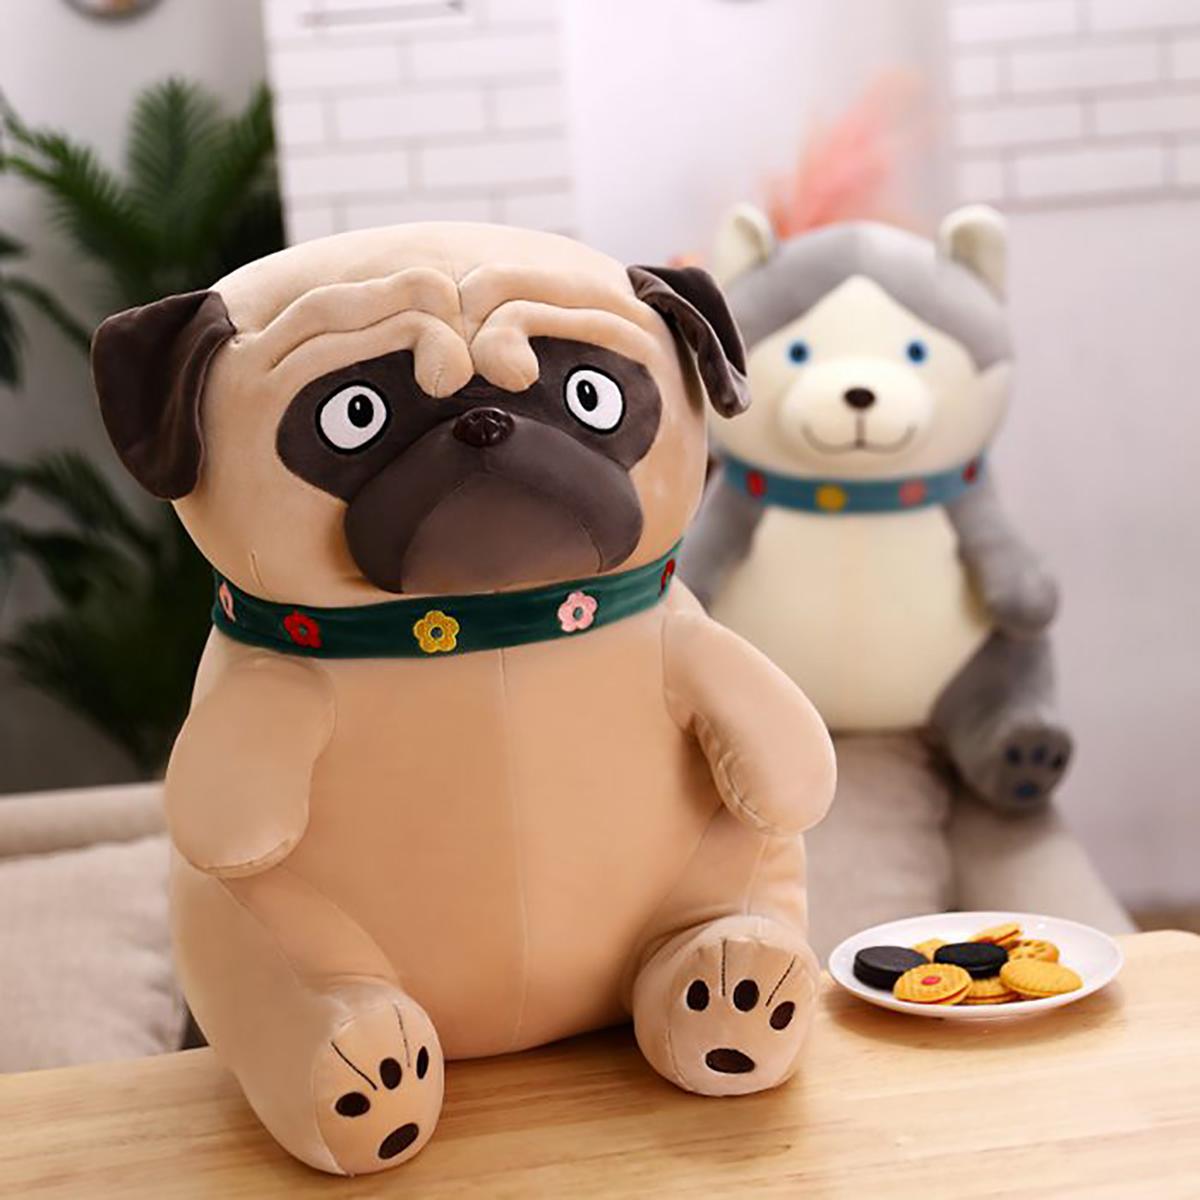 40-65CM Sand Dogs Doll Stuffed Simulation Dogs Plush Sharpei Pug Lovely Puppy Pet Toy Plush Animal Toy Children Kids Birthday Christmas Gifts - Photo: 2